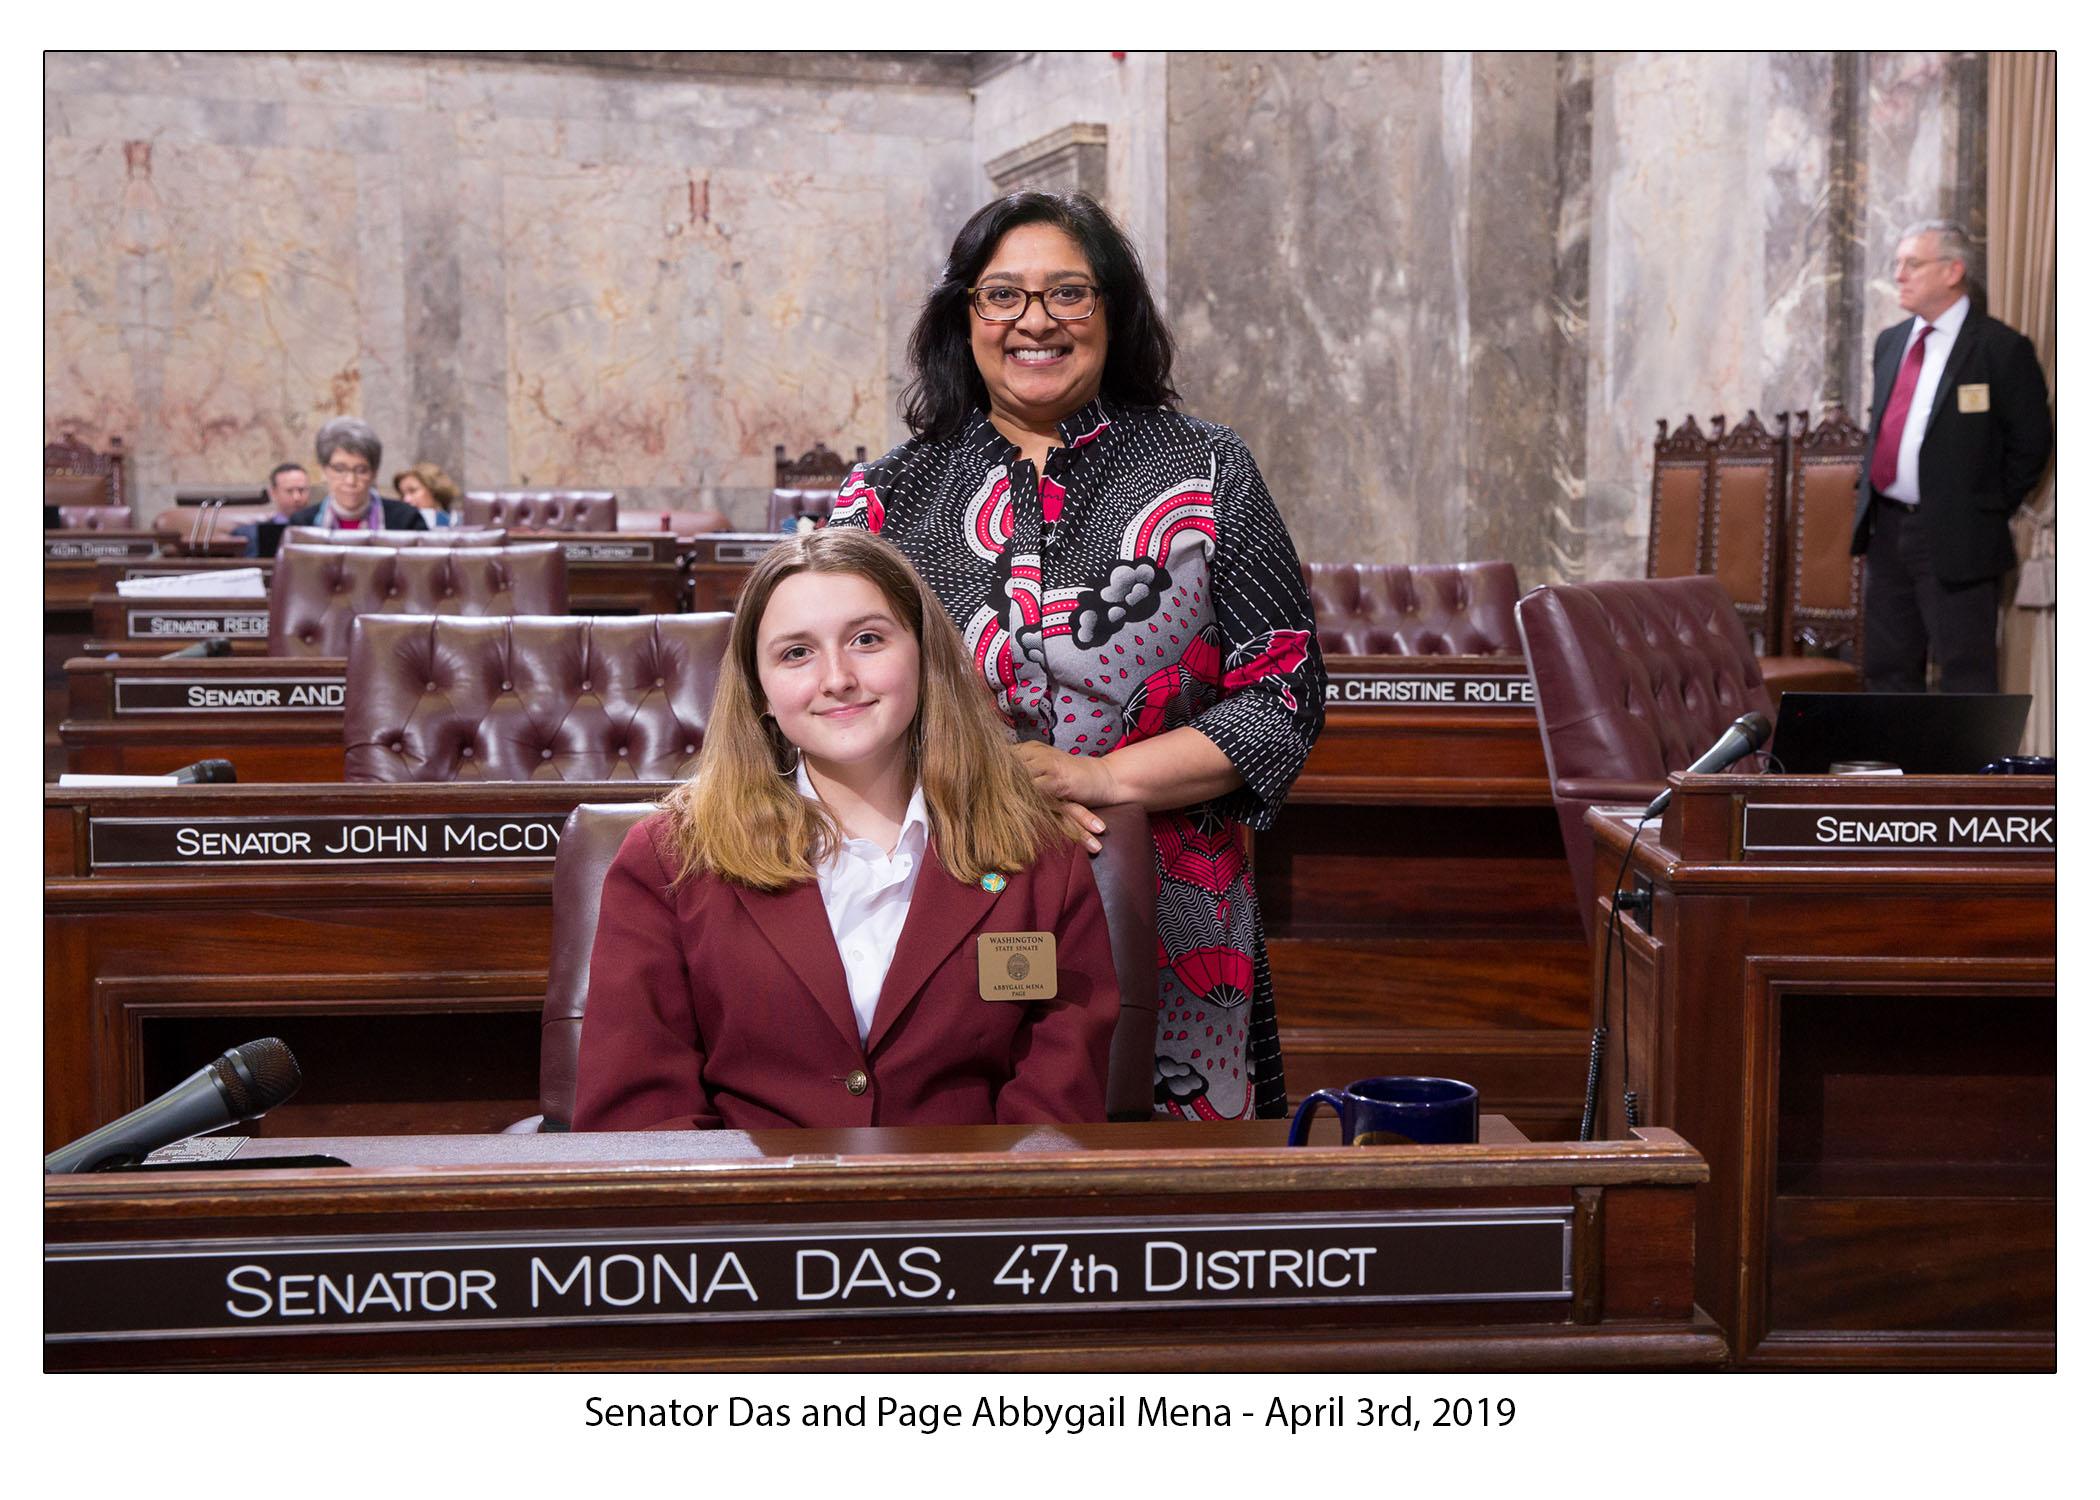 Mona Das, Senator Mona Das, Abbygail Mena